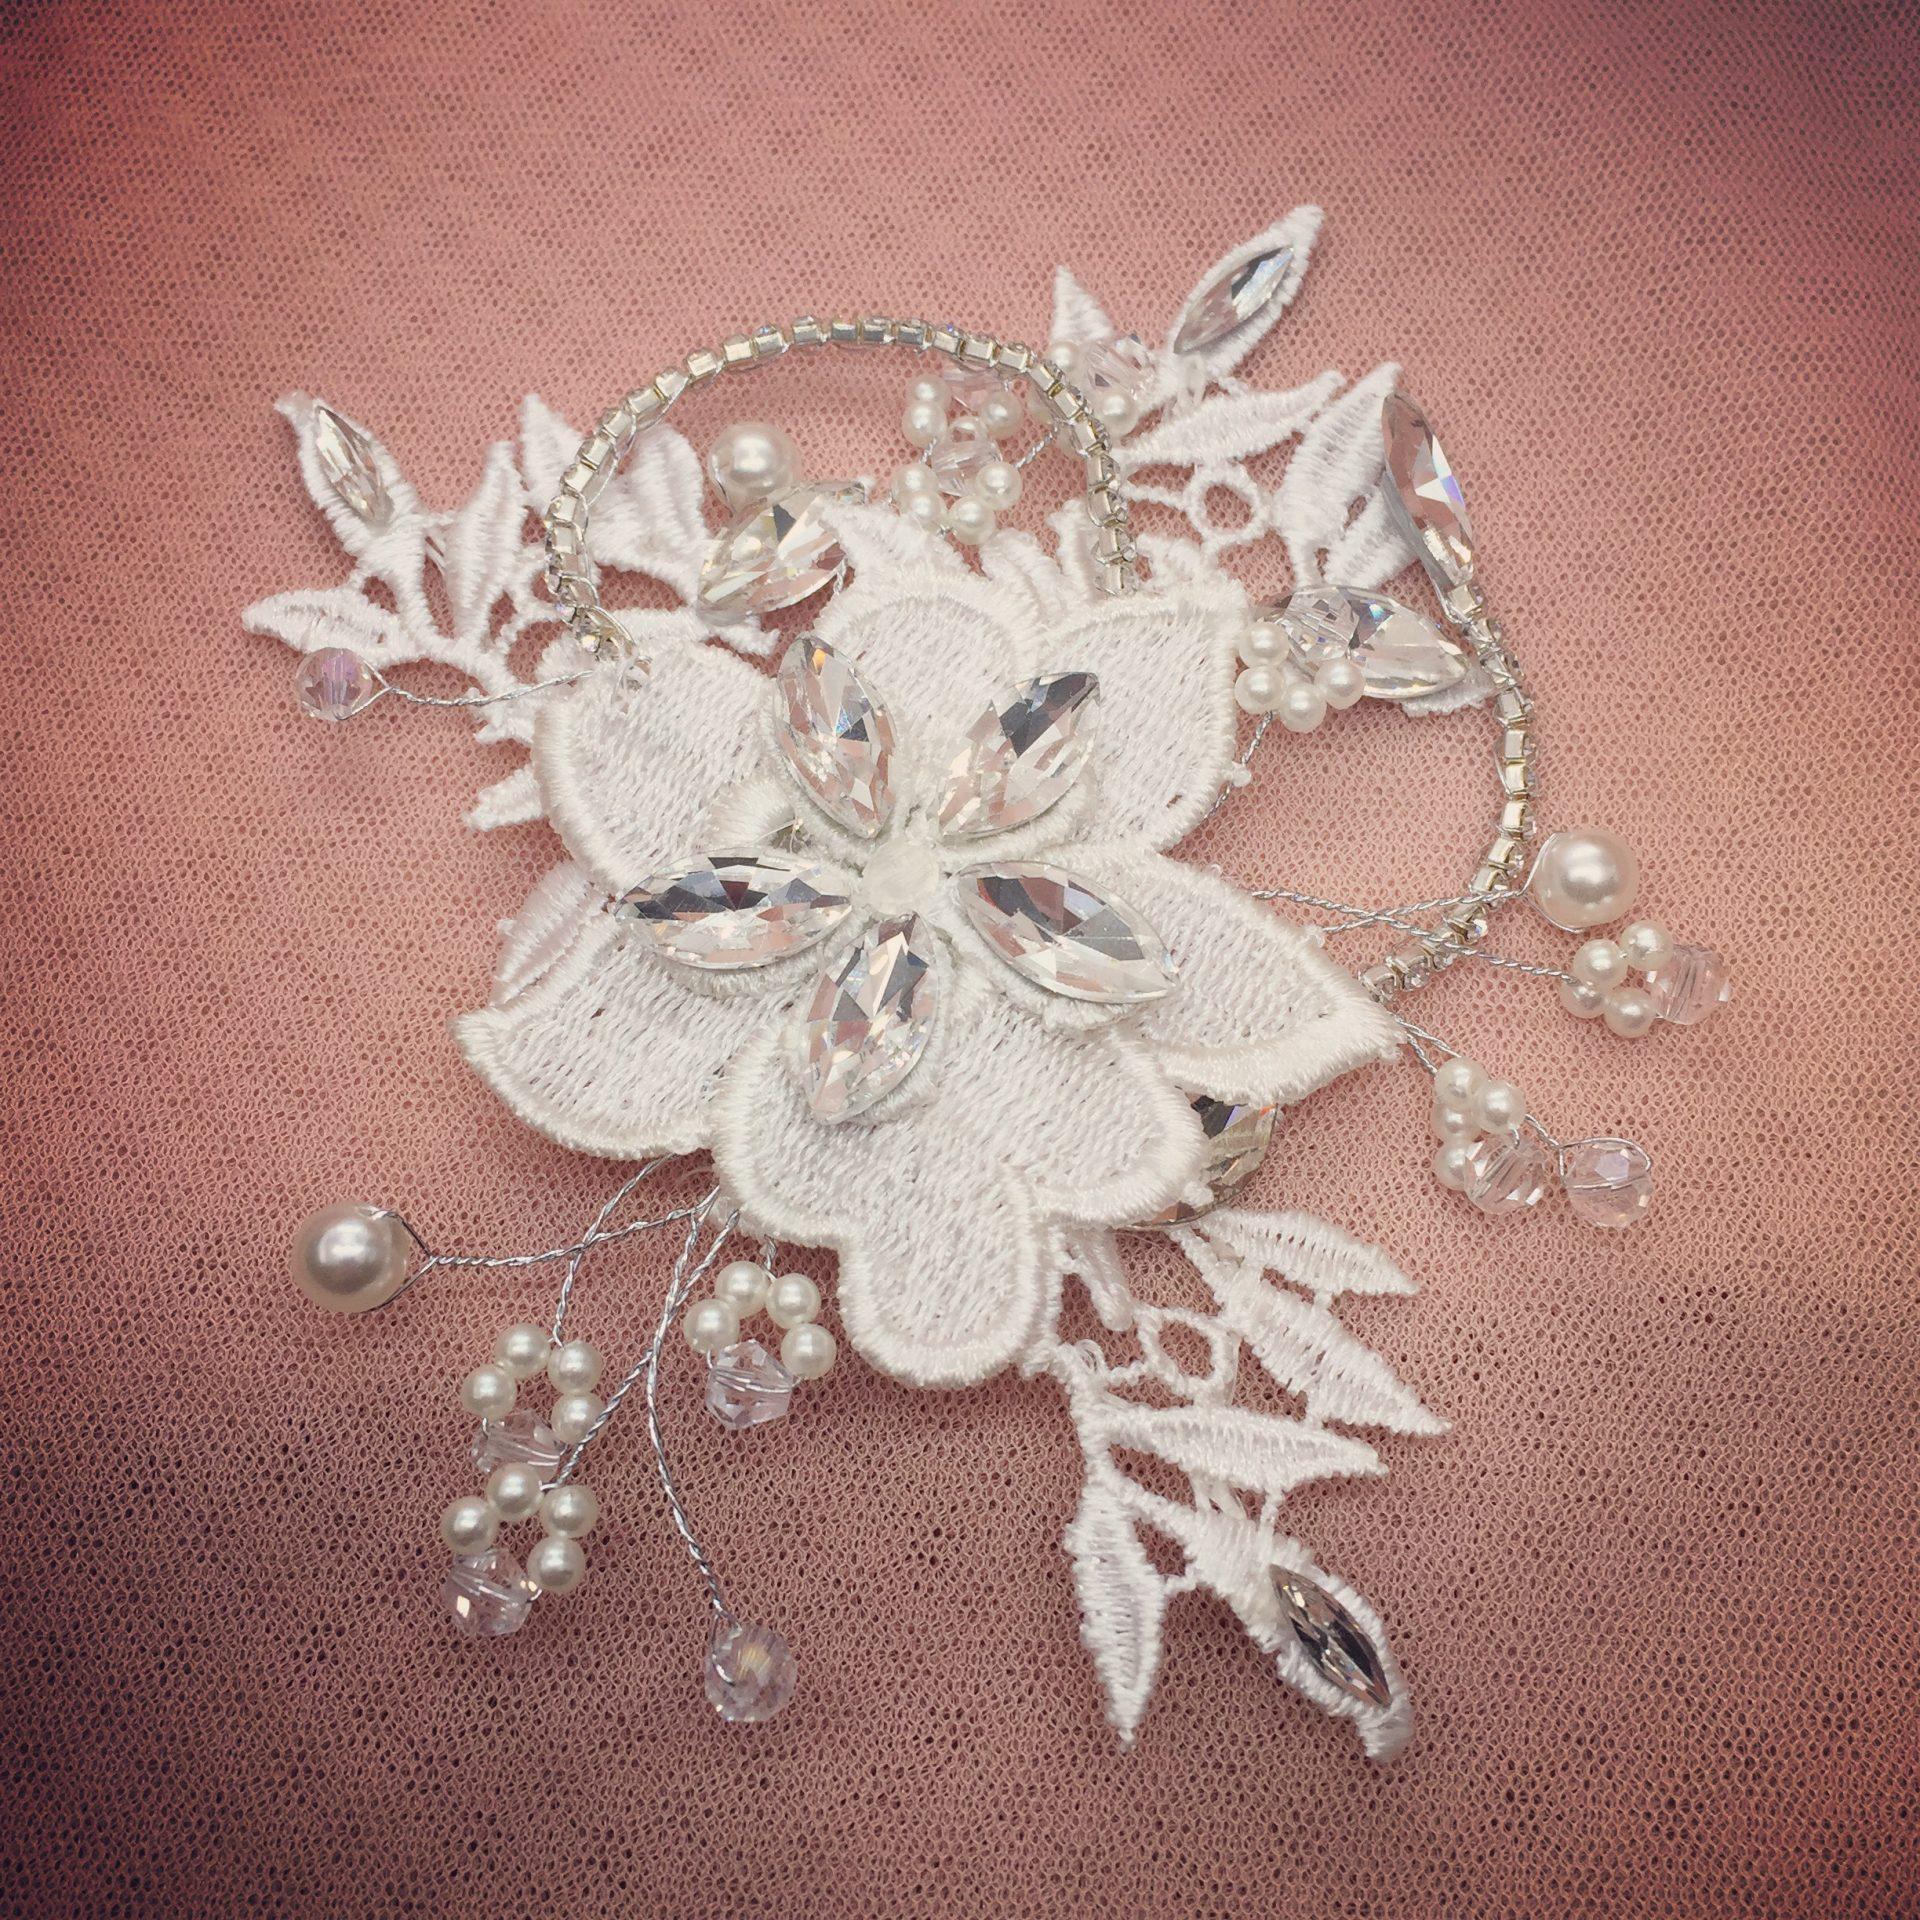 3. Floral Fashionista – Clip (i)